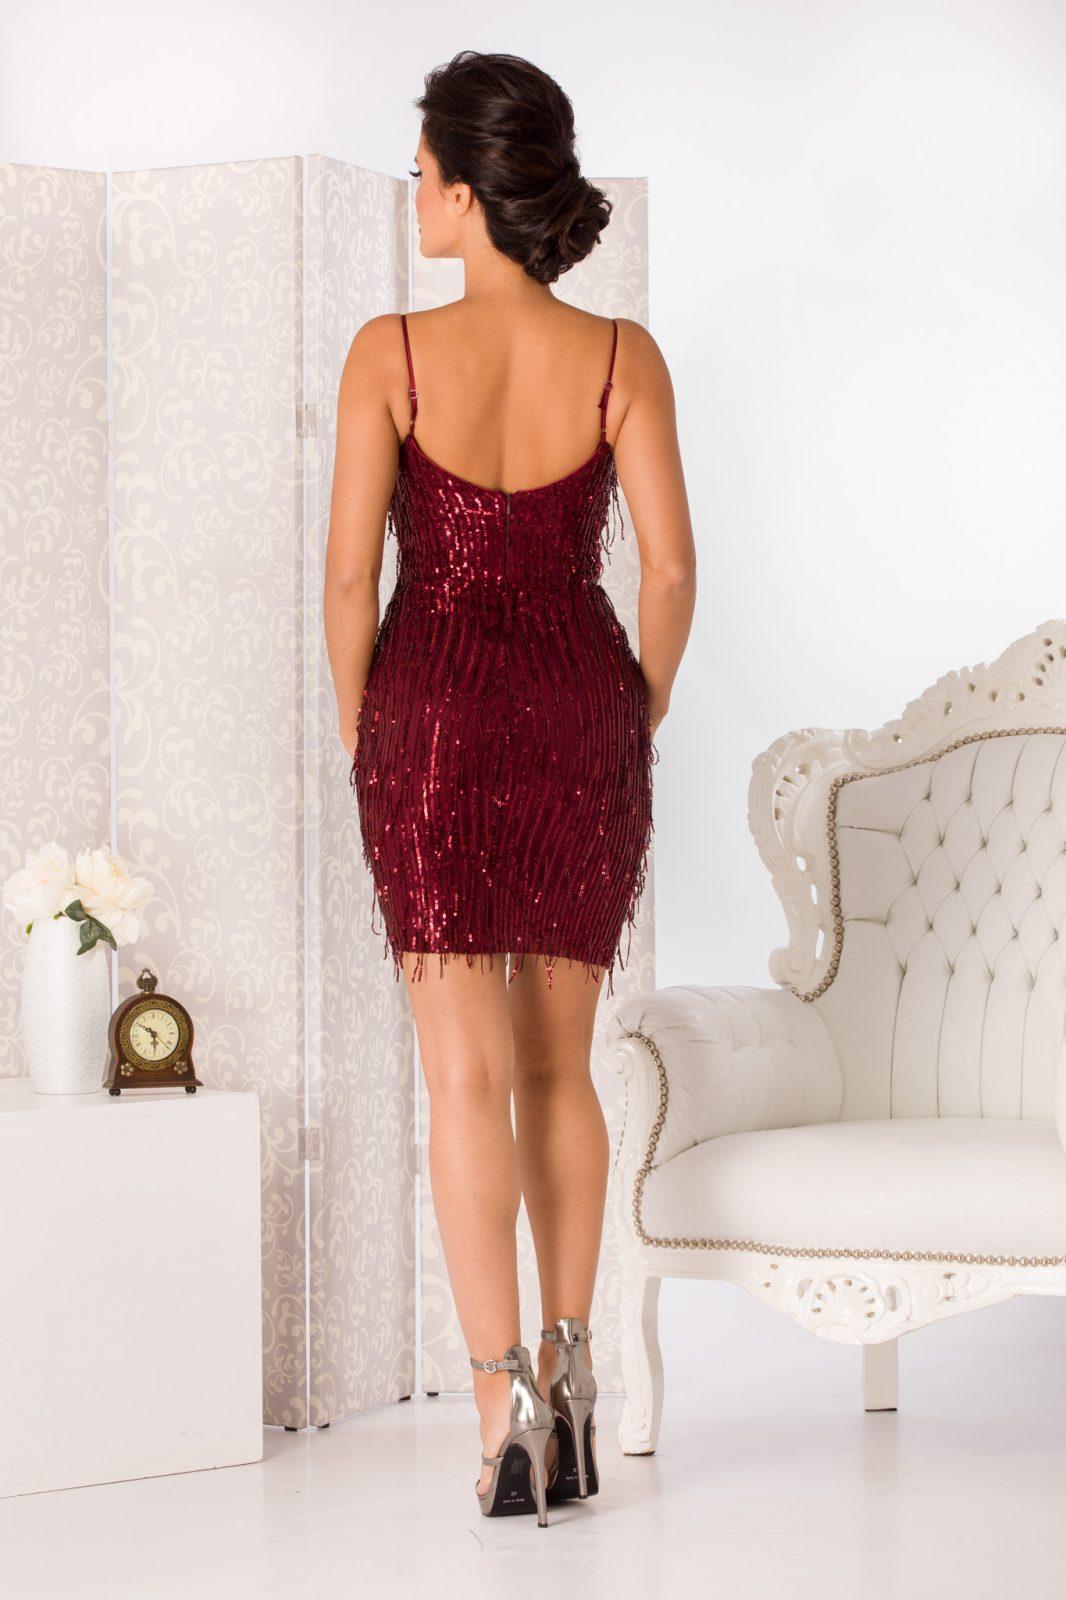 Spicy Mini Μπορντό Φόρεμα 4949 1